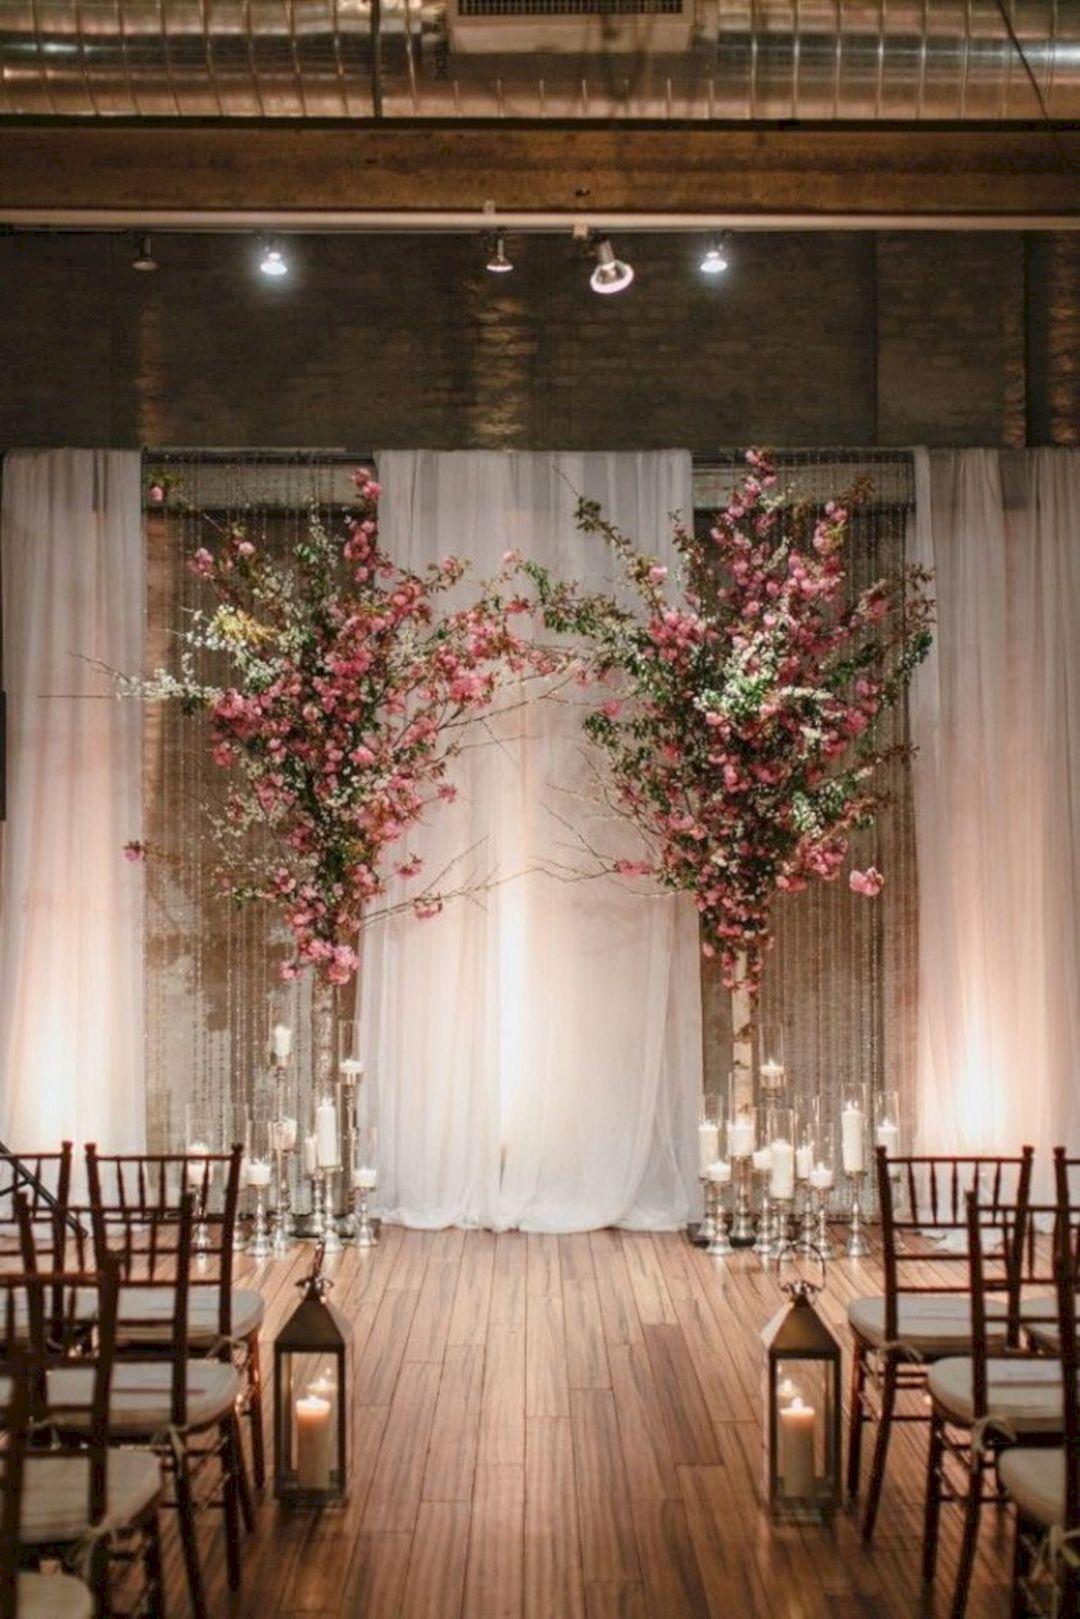 20+ Wonderful Wedding Backdrop Ideas For Perfect Wedding Party Indoor wedding ceremonies